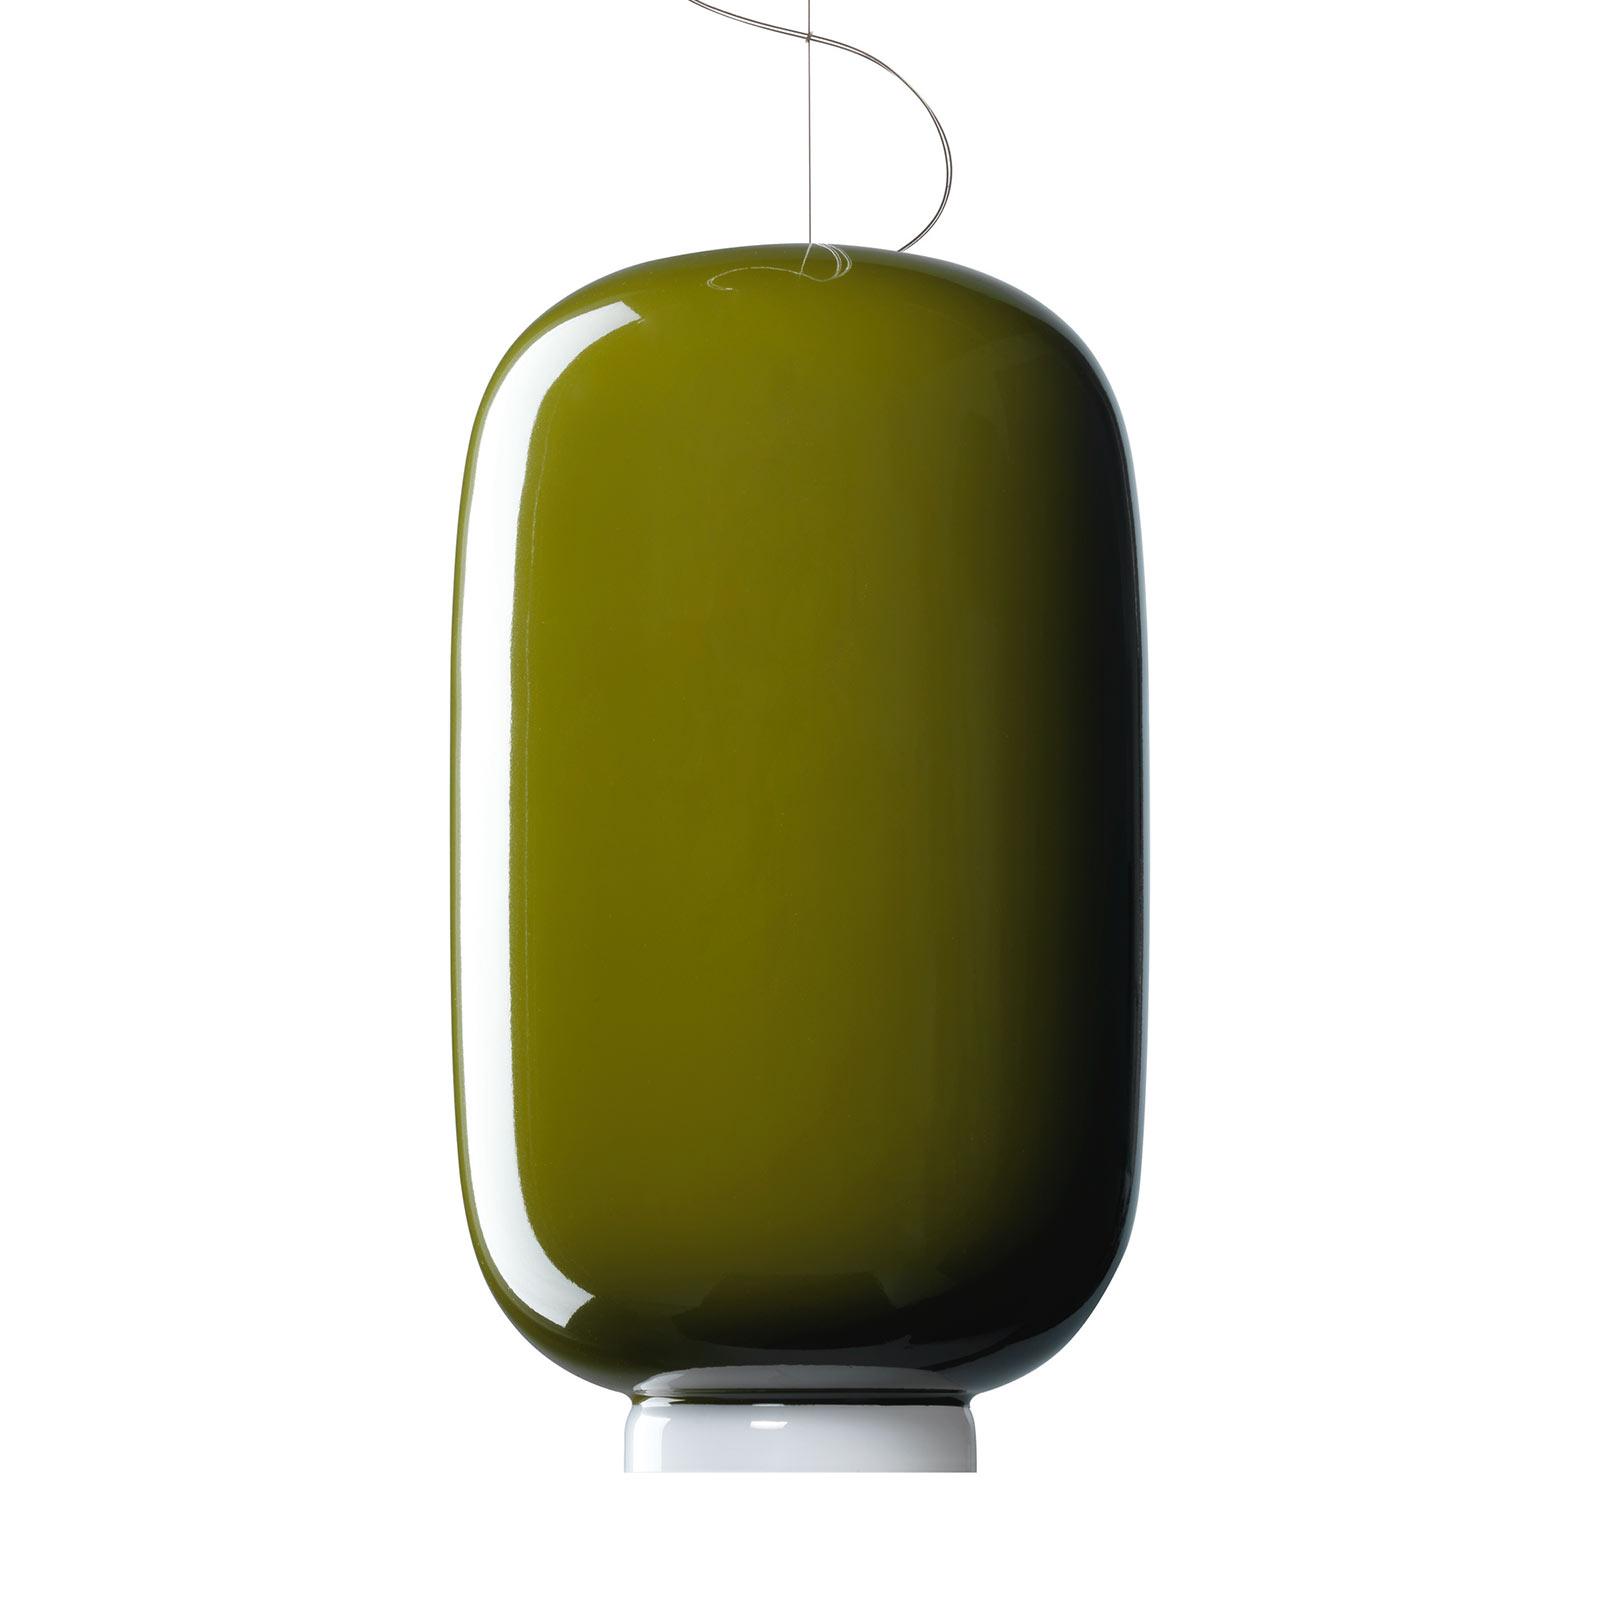 Foscarini MyLight Chouchin 2 LED-Hängelampe grün